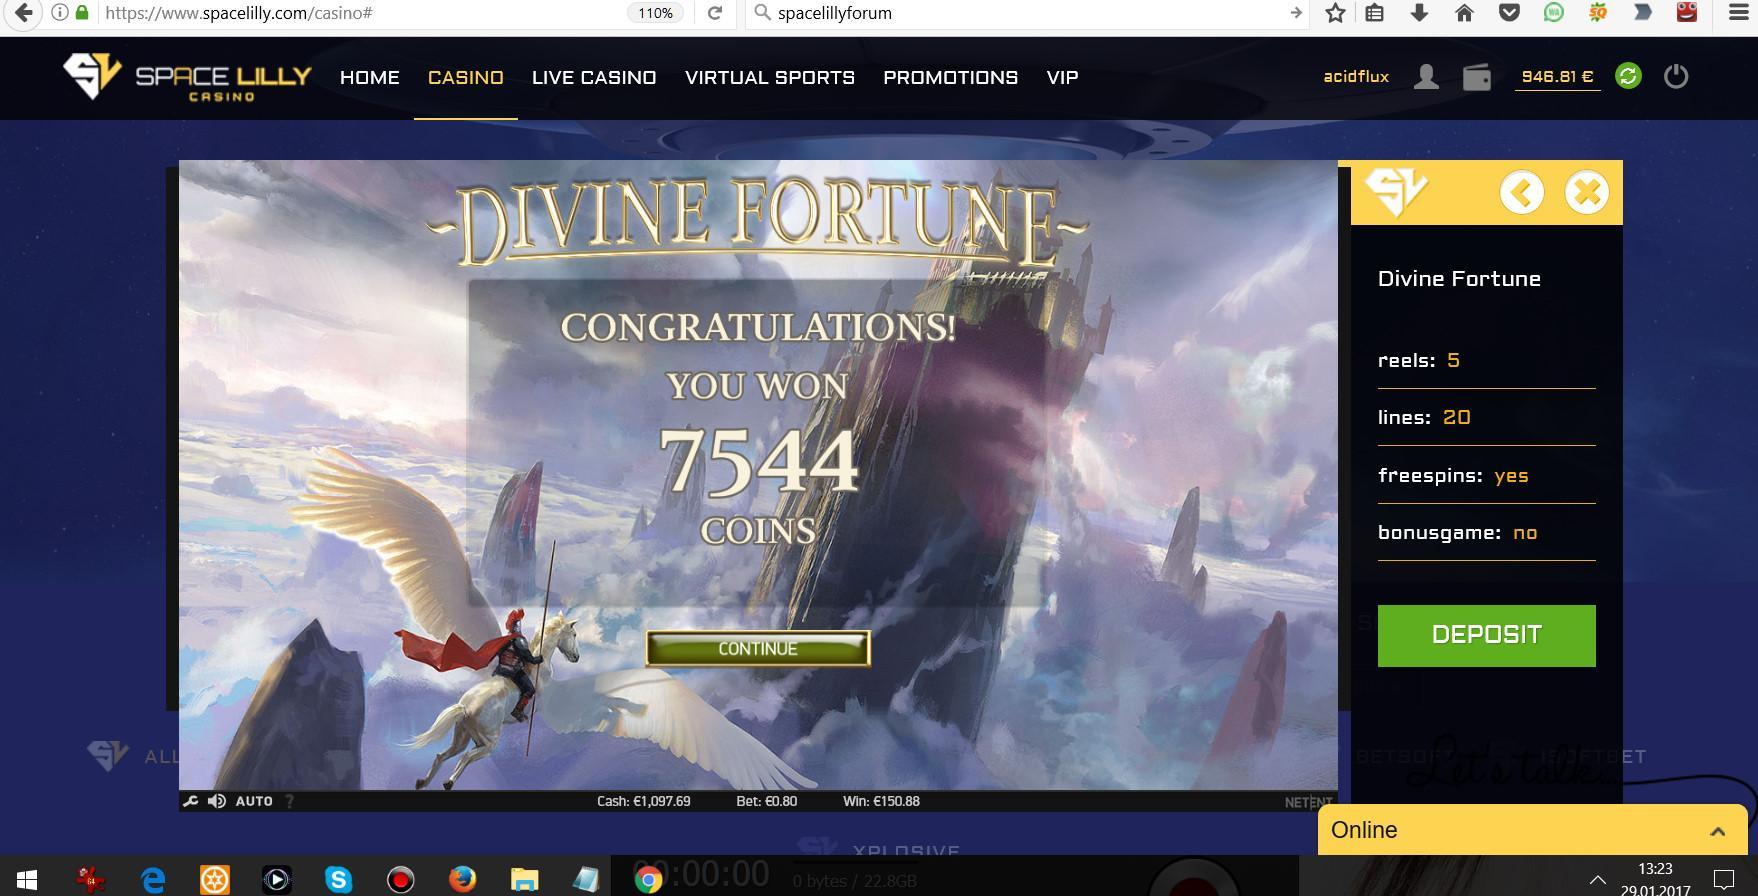 29.01.2017 - 13:23 (GMT+1) Divine Fortune